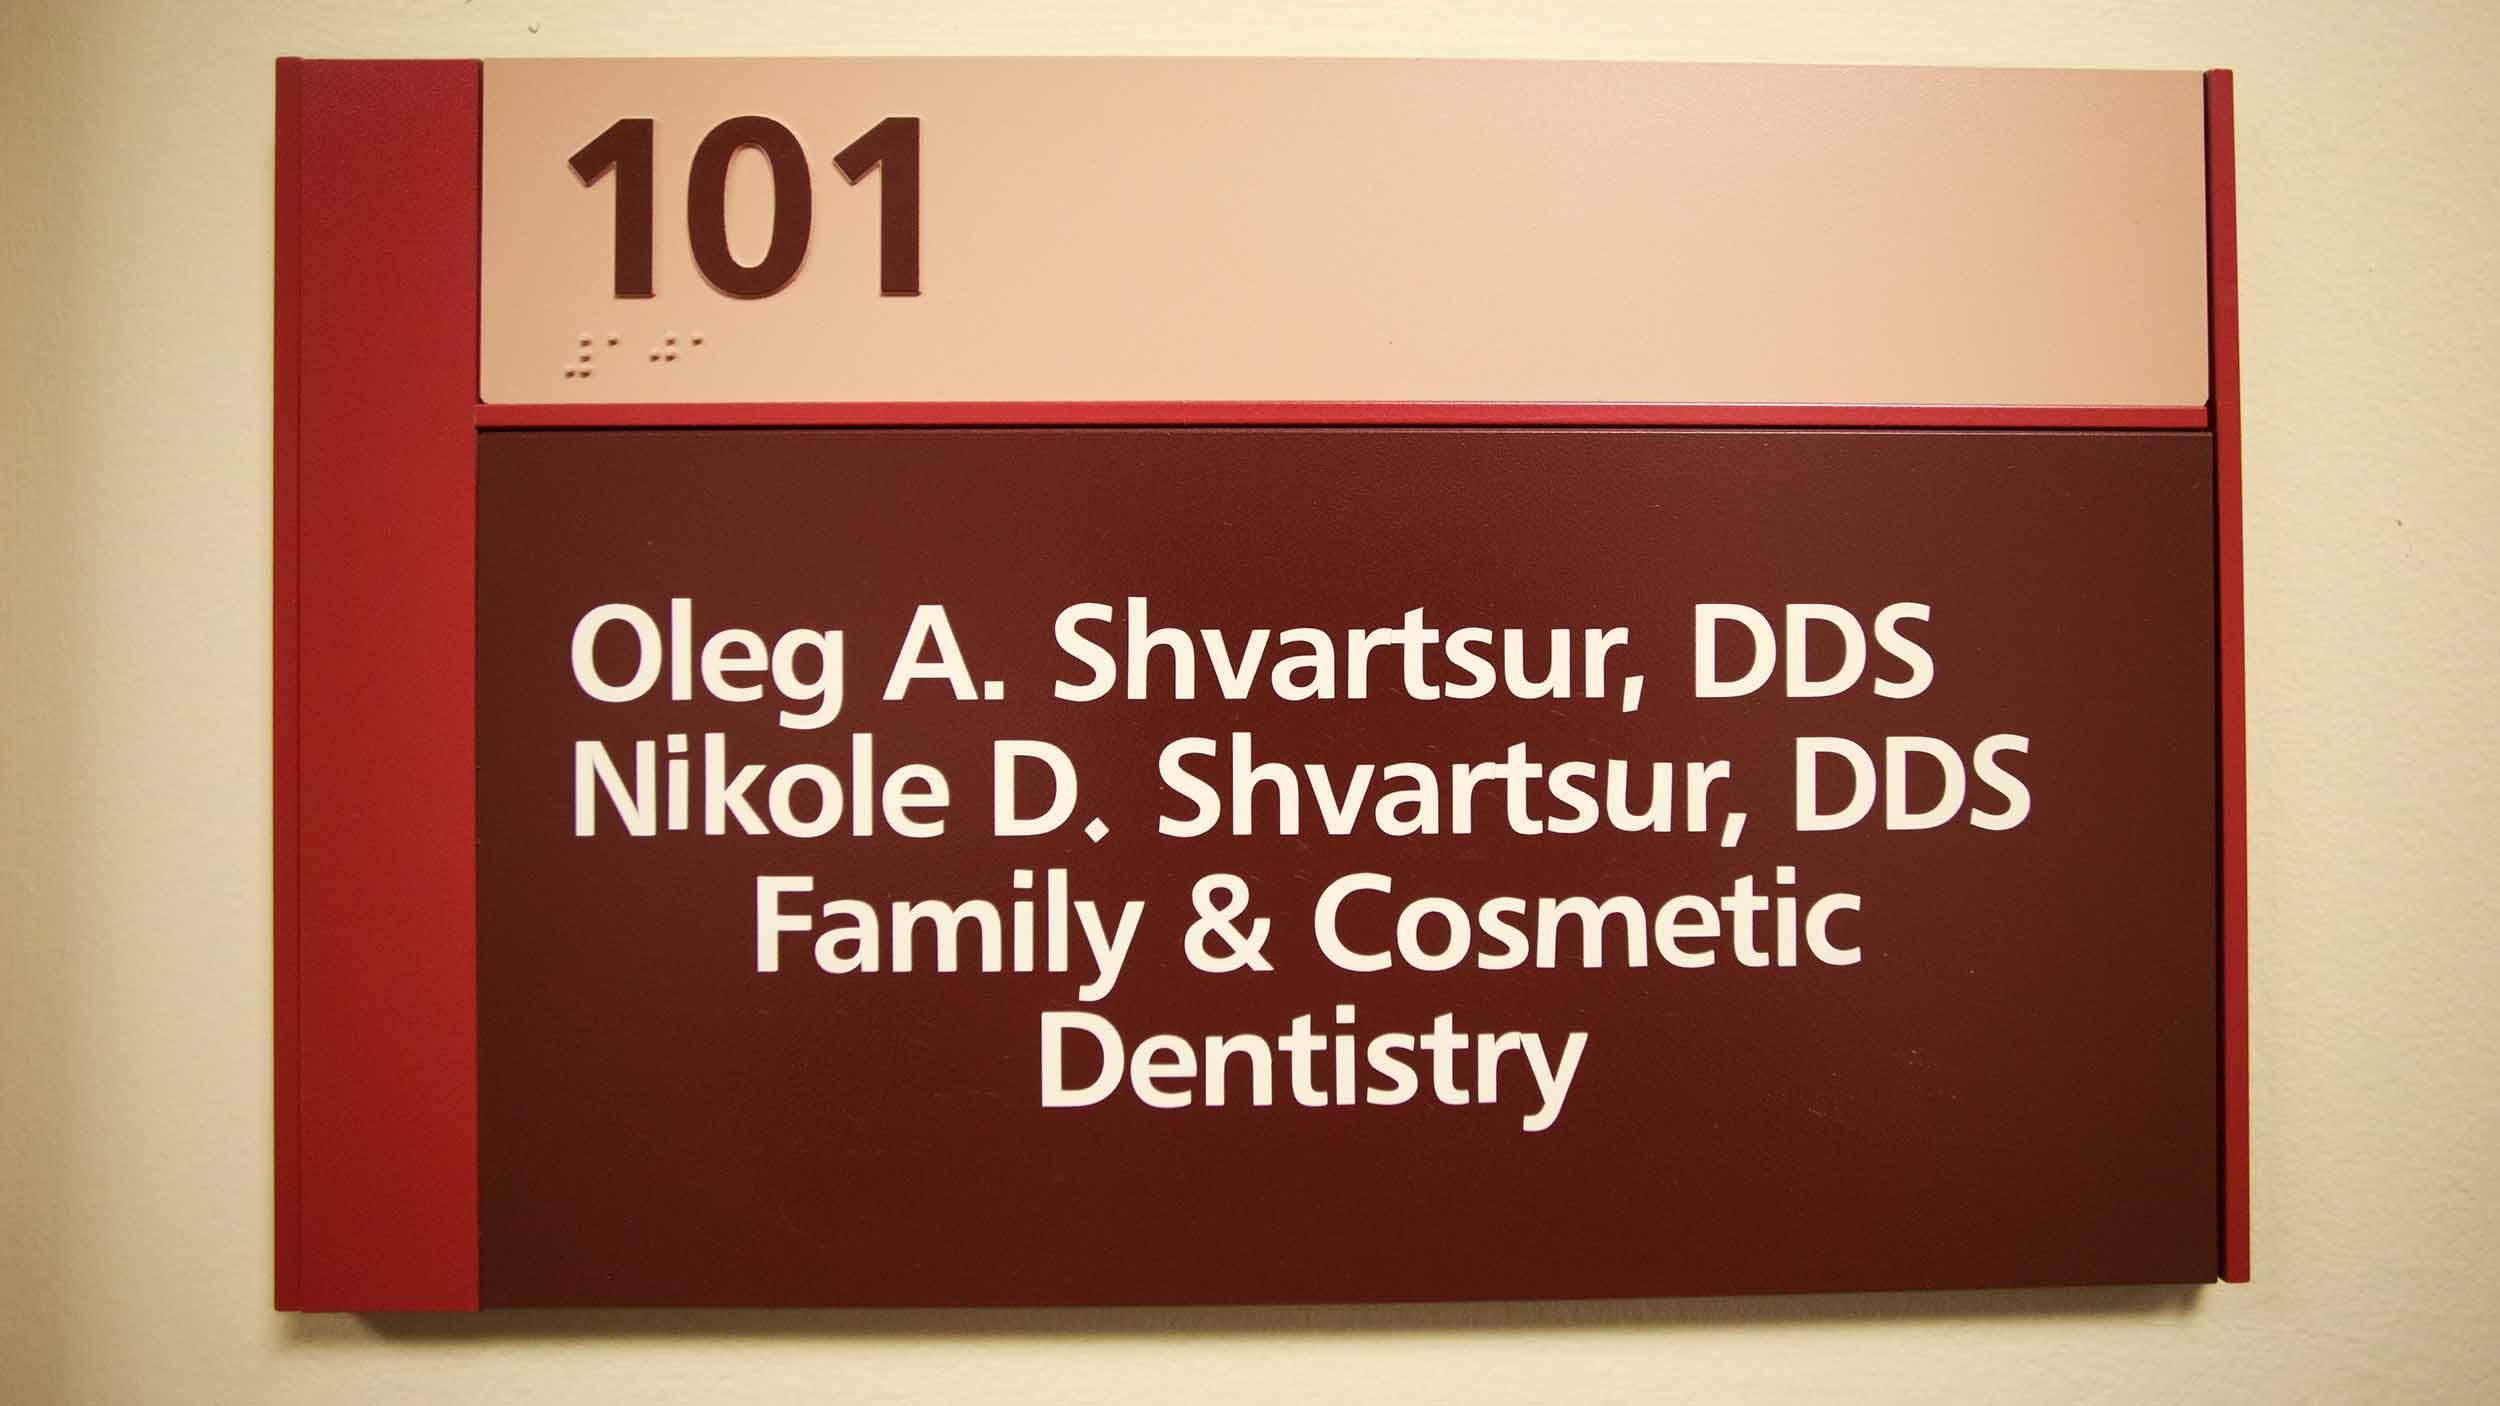 425 Dental Office Tour Web_0003_4-1701-DrOBldg.jpg